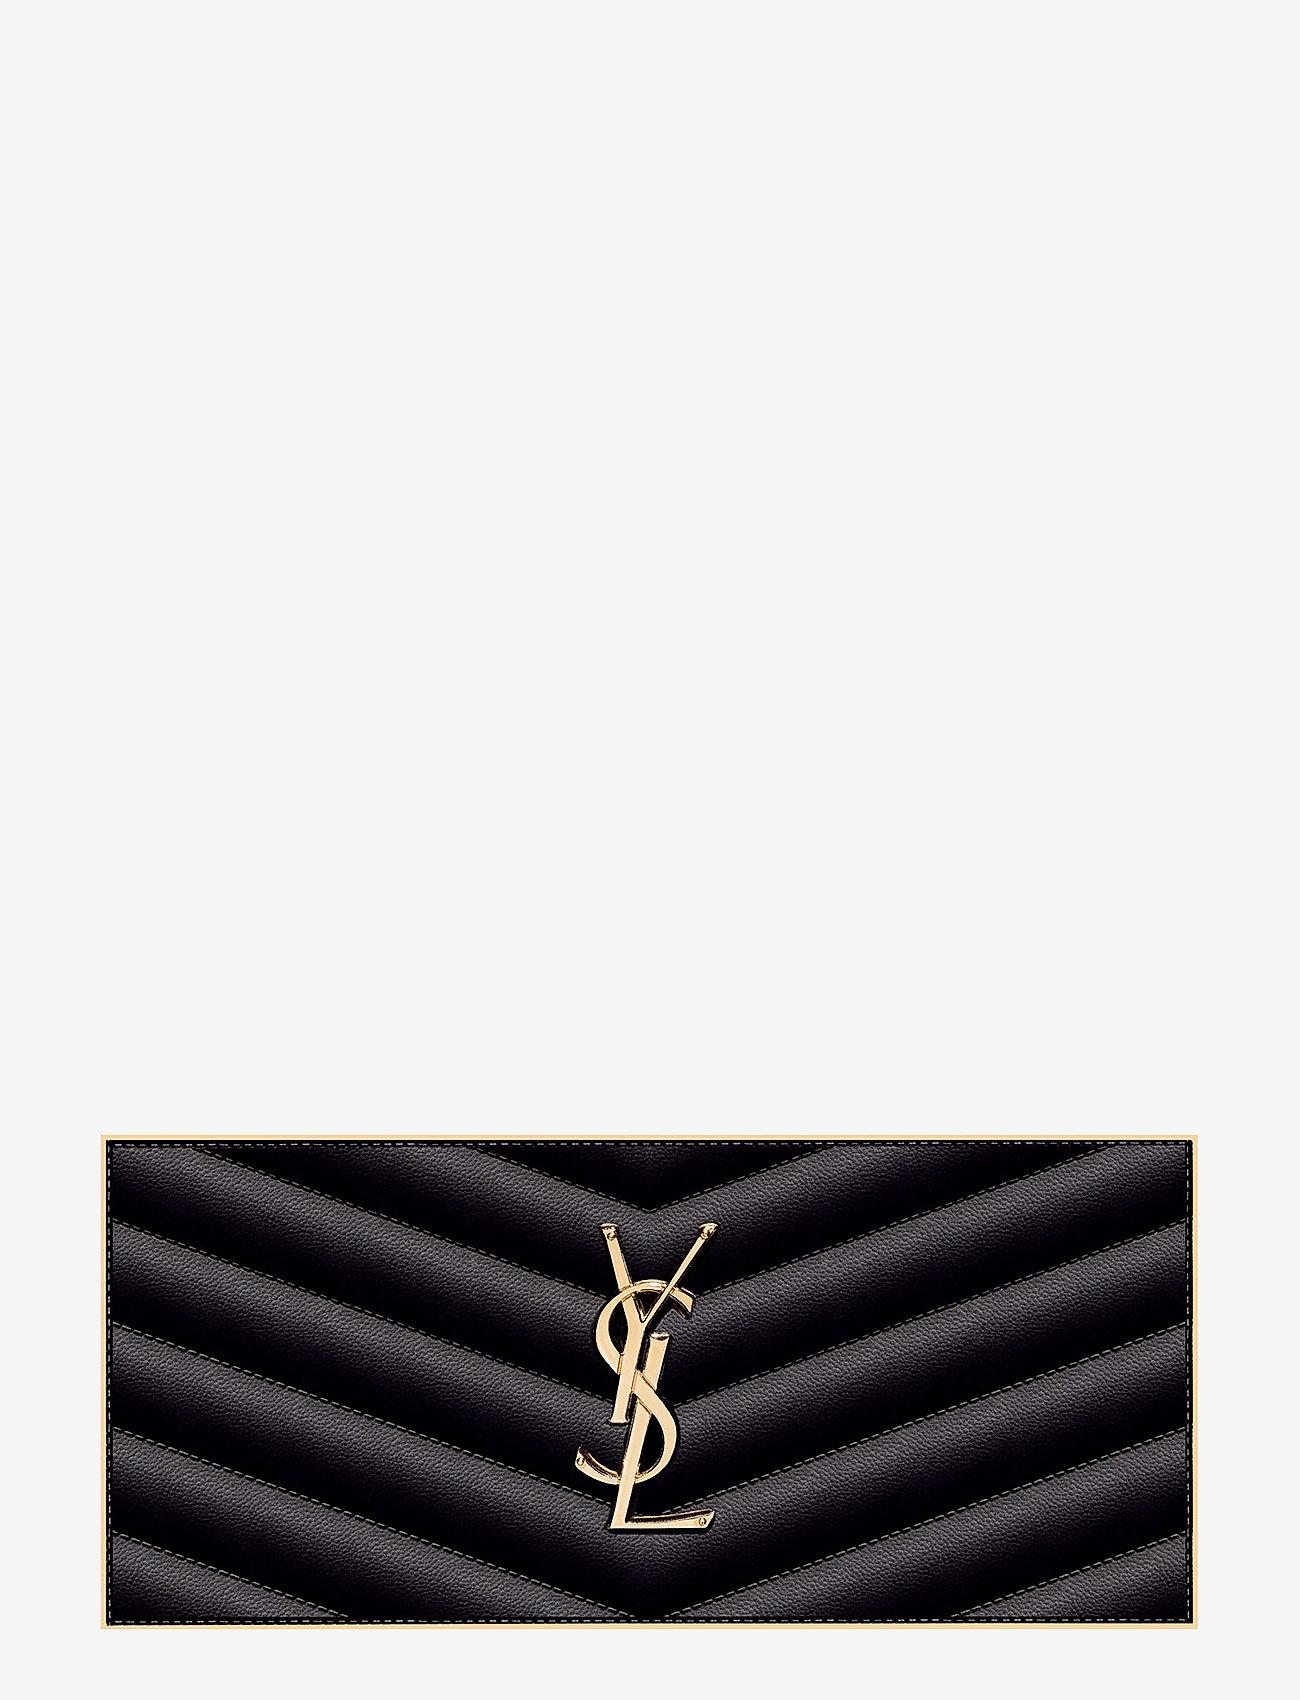 Yves Saint Laurent - YSL Couture Colour Clutch Marrakech - Ögonskuggspalett - marrakech - 1